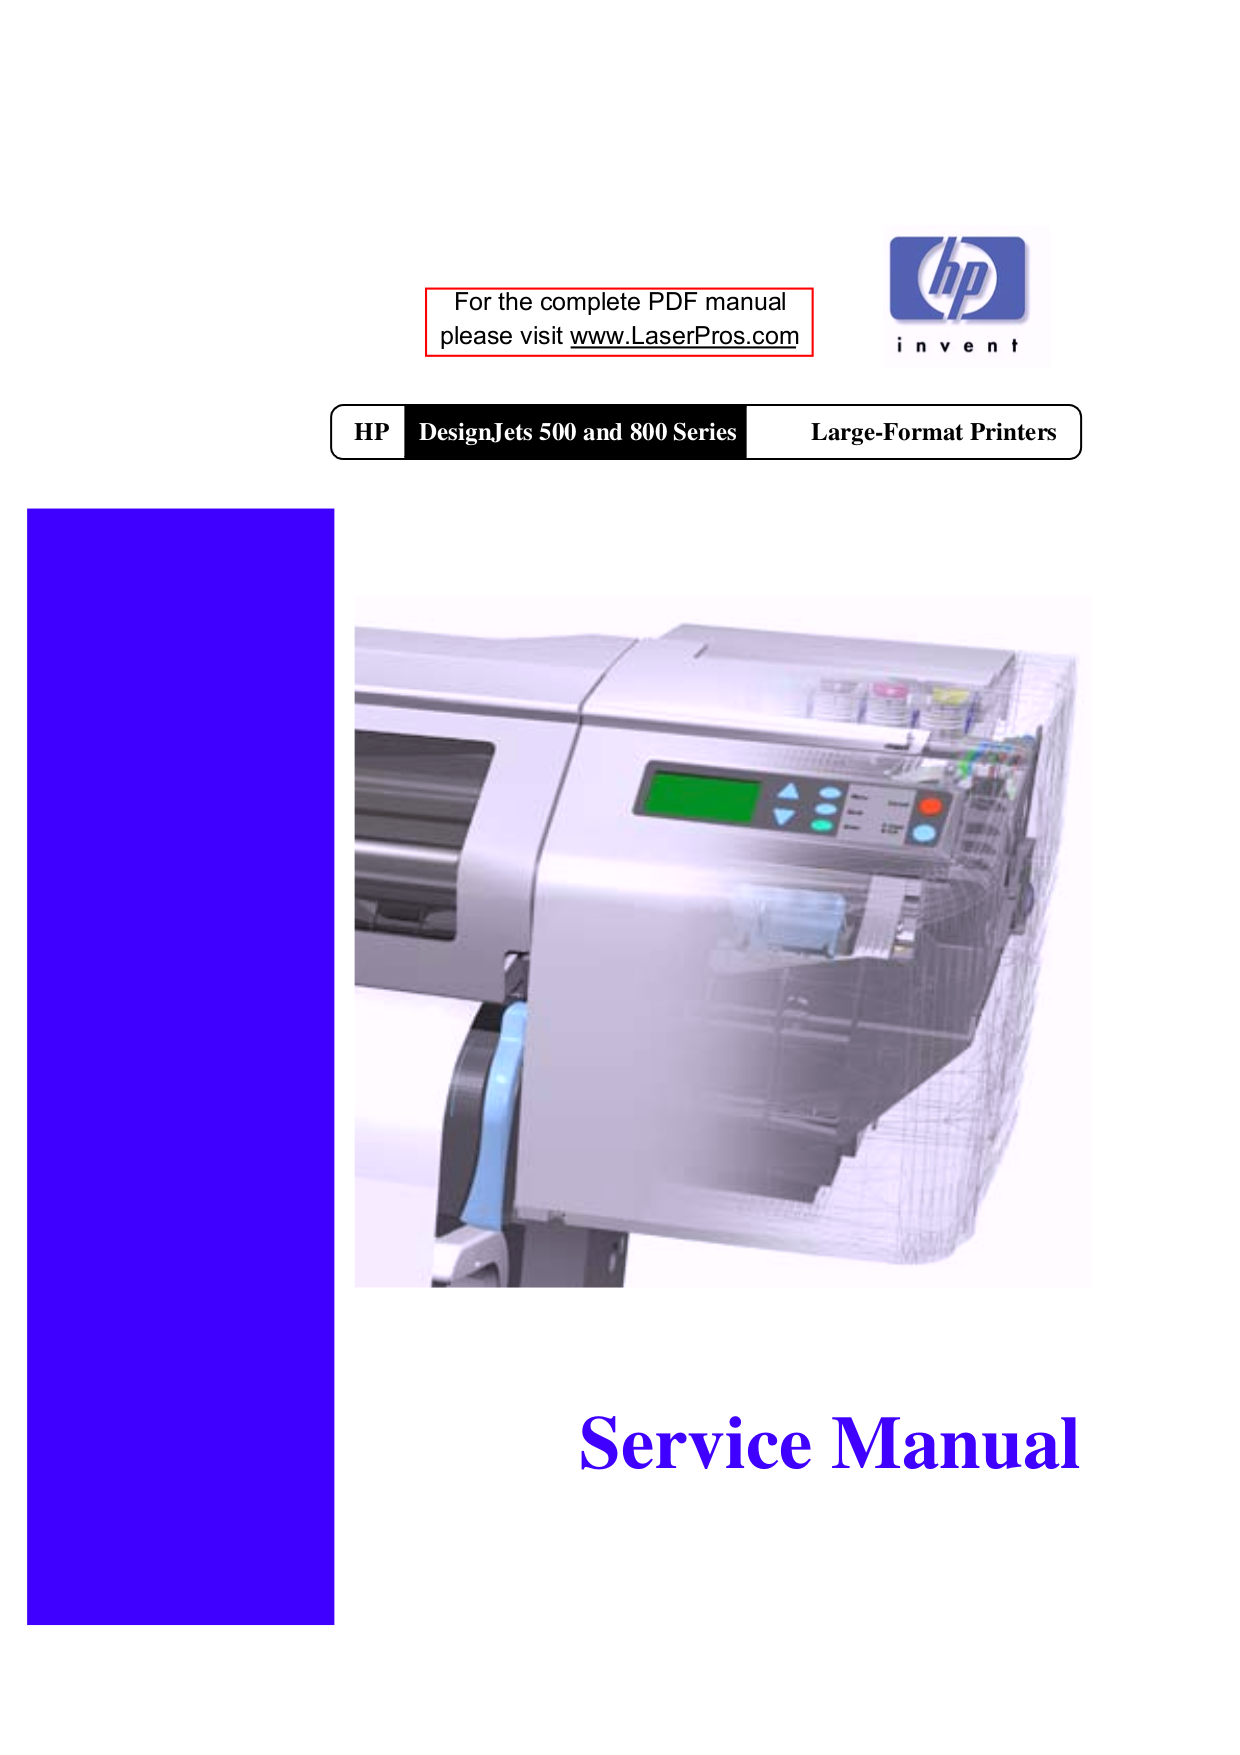 Hp 1055Cm Plotter Manual